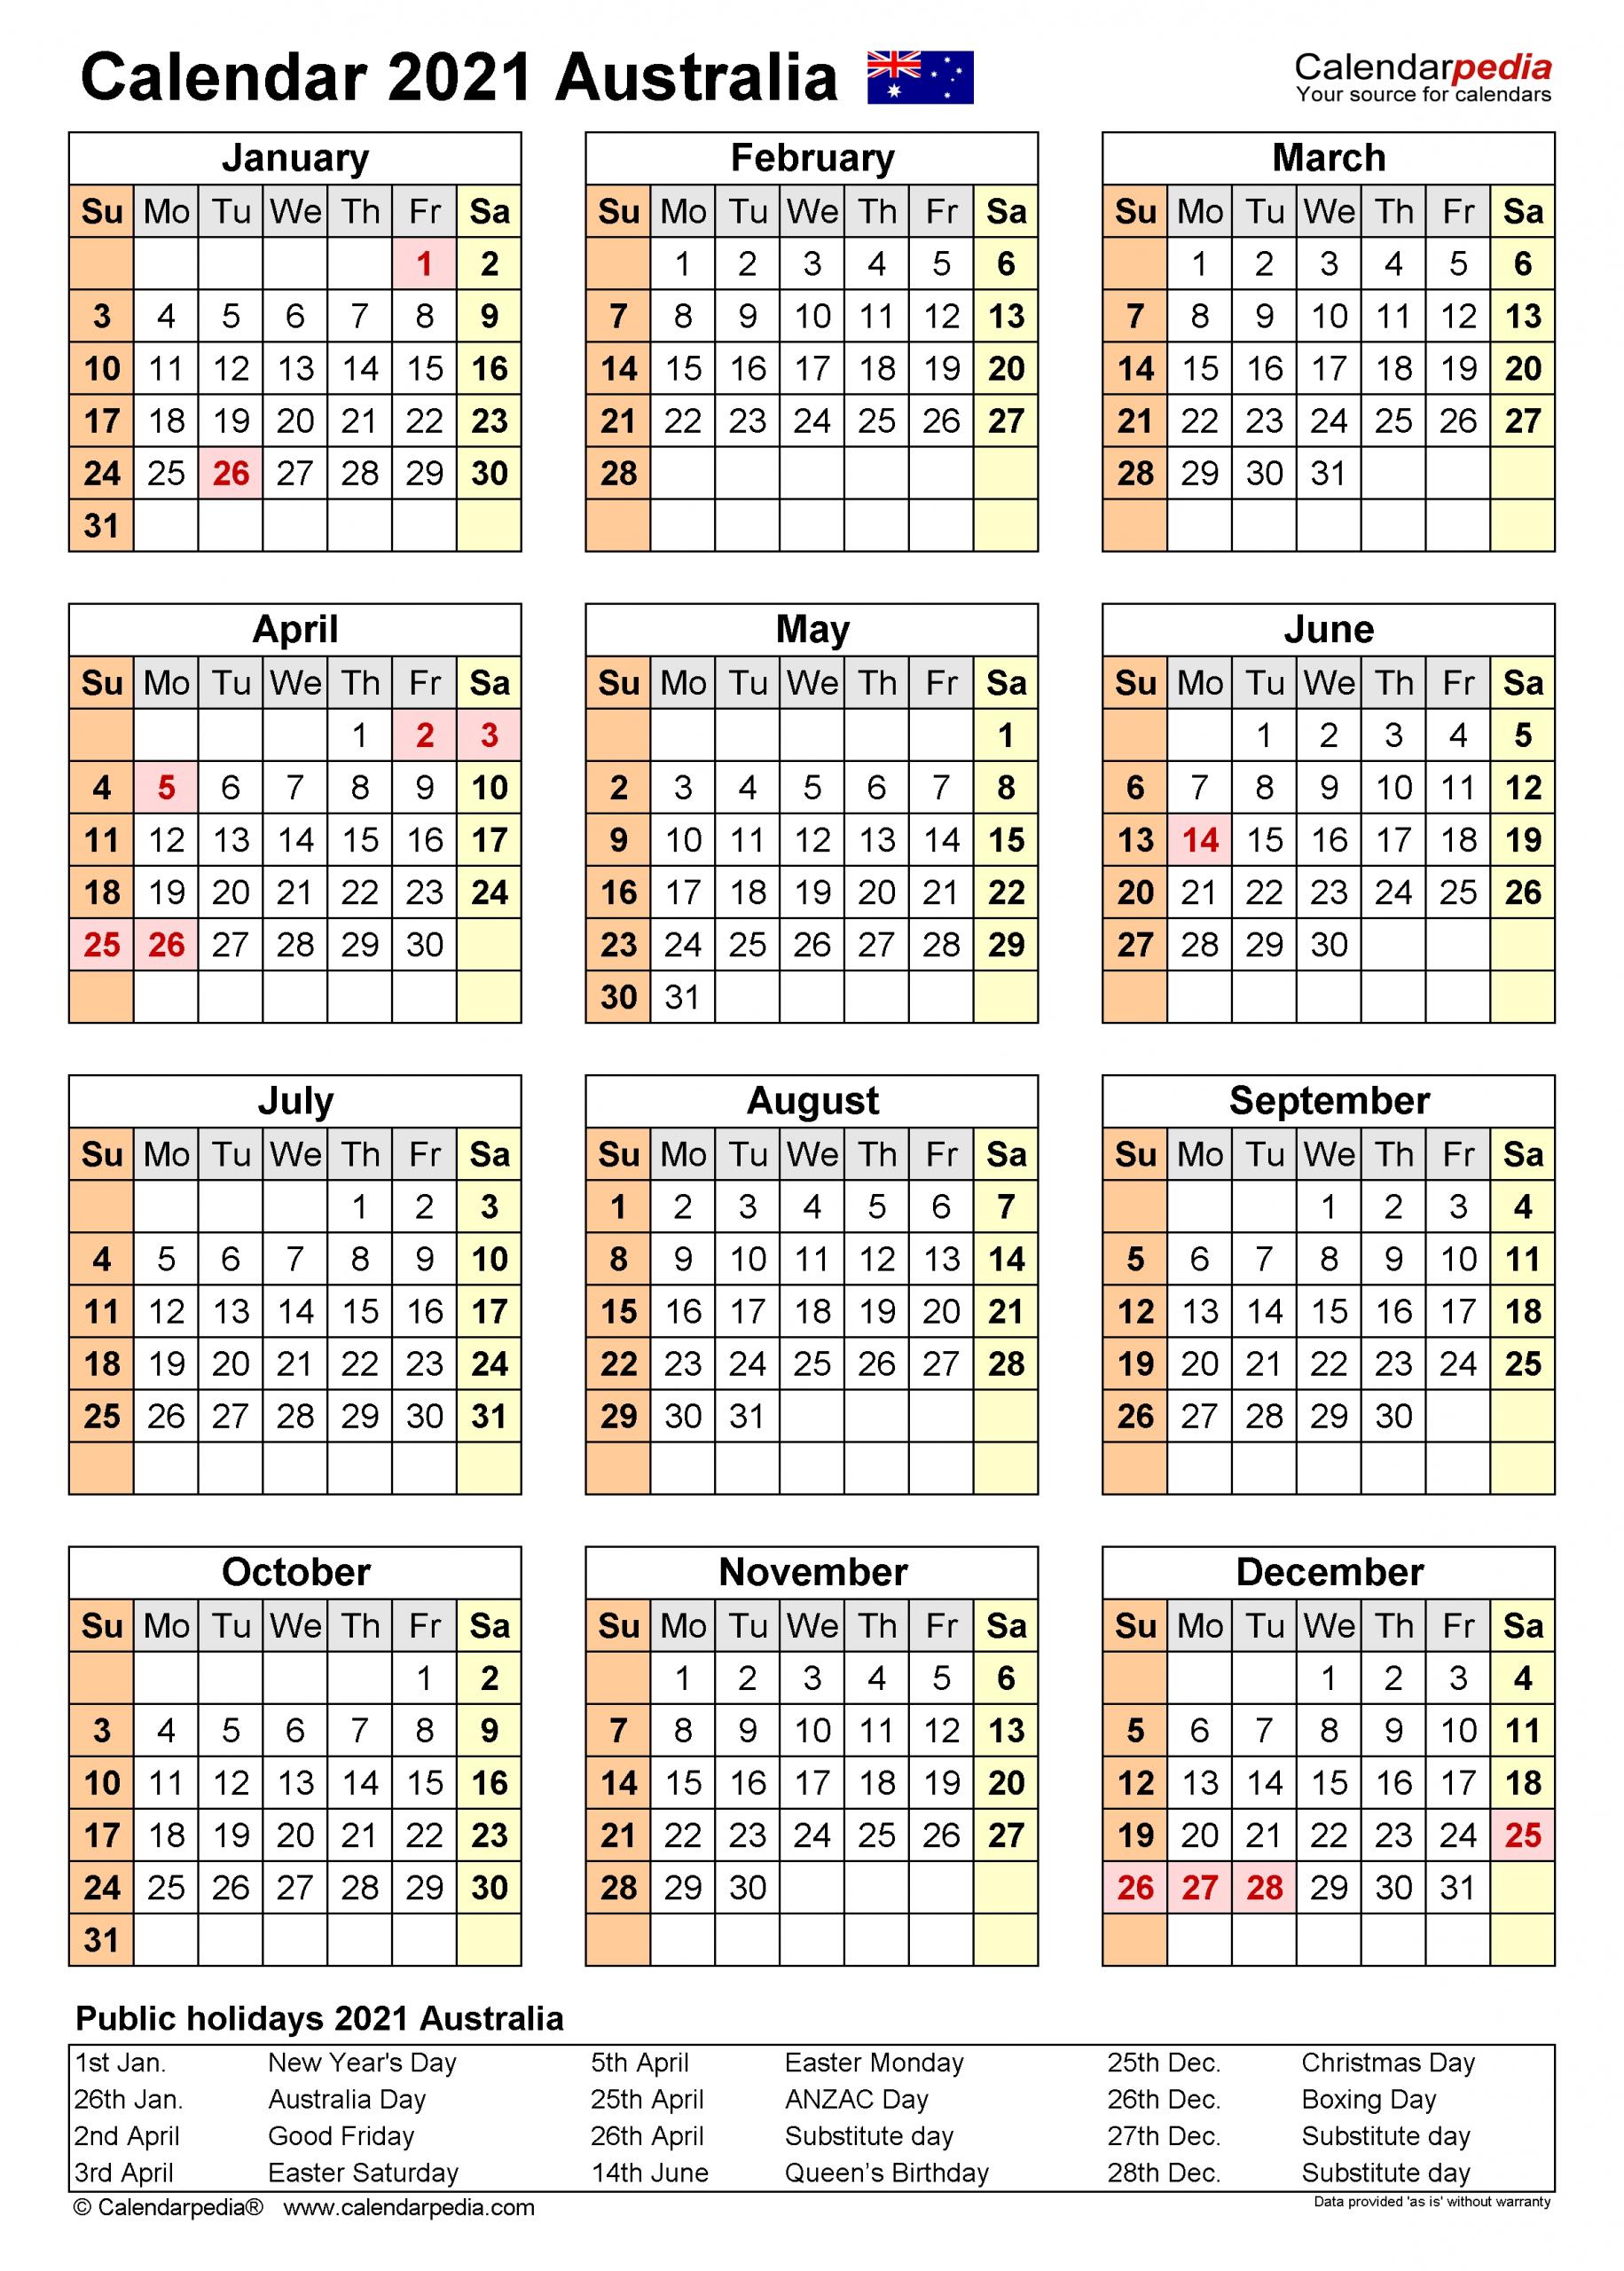 2021 Financial Year Dates Australia - Template Calendar Design December 2020 January 2021 Calendar Australia